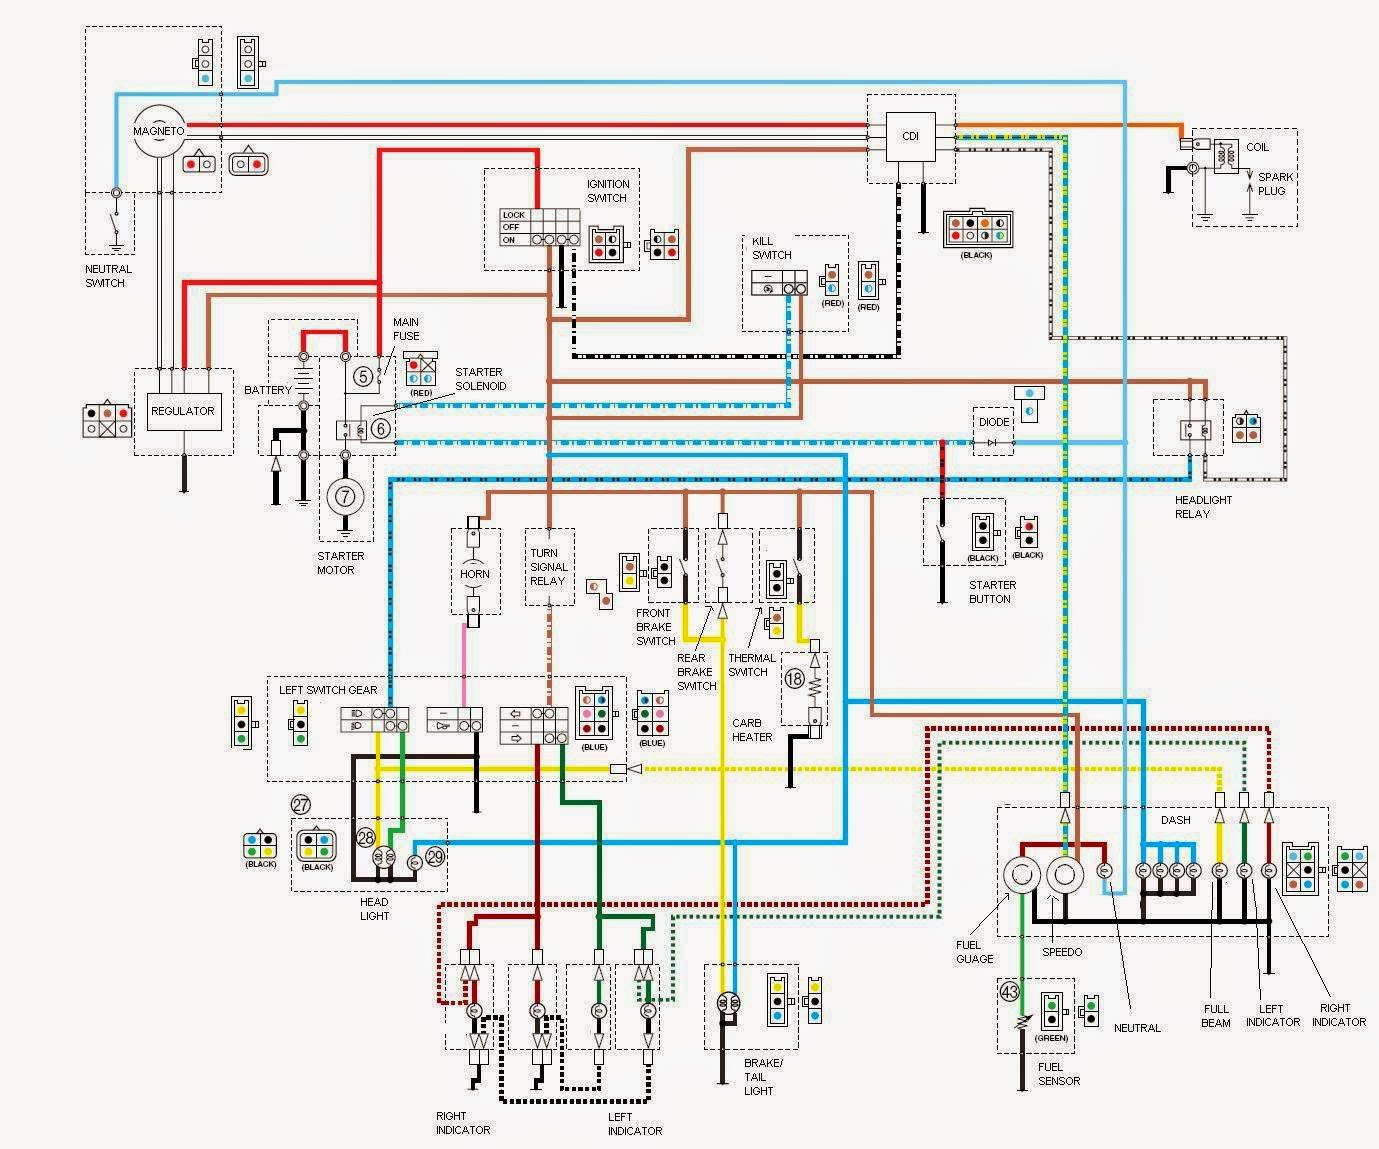 vino 125 wiring diagram fav wiring diagram Yamaha Vino 125 by Dealers